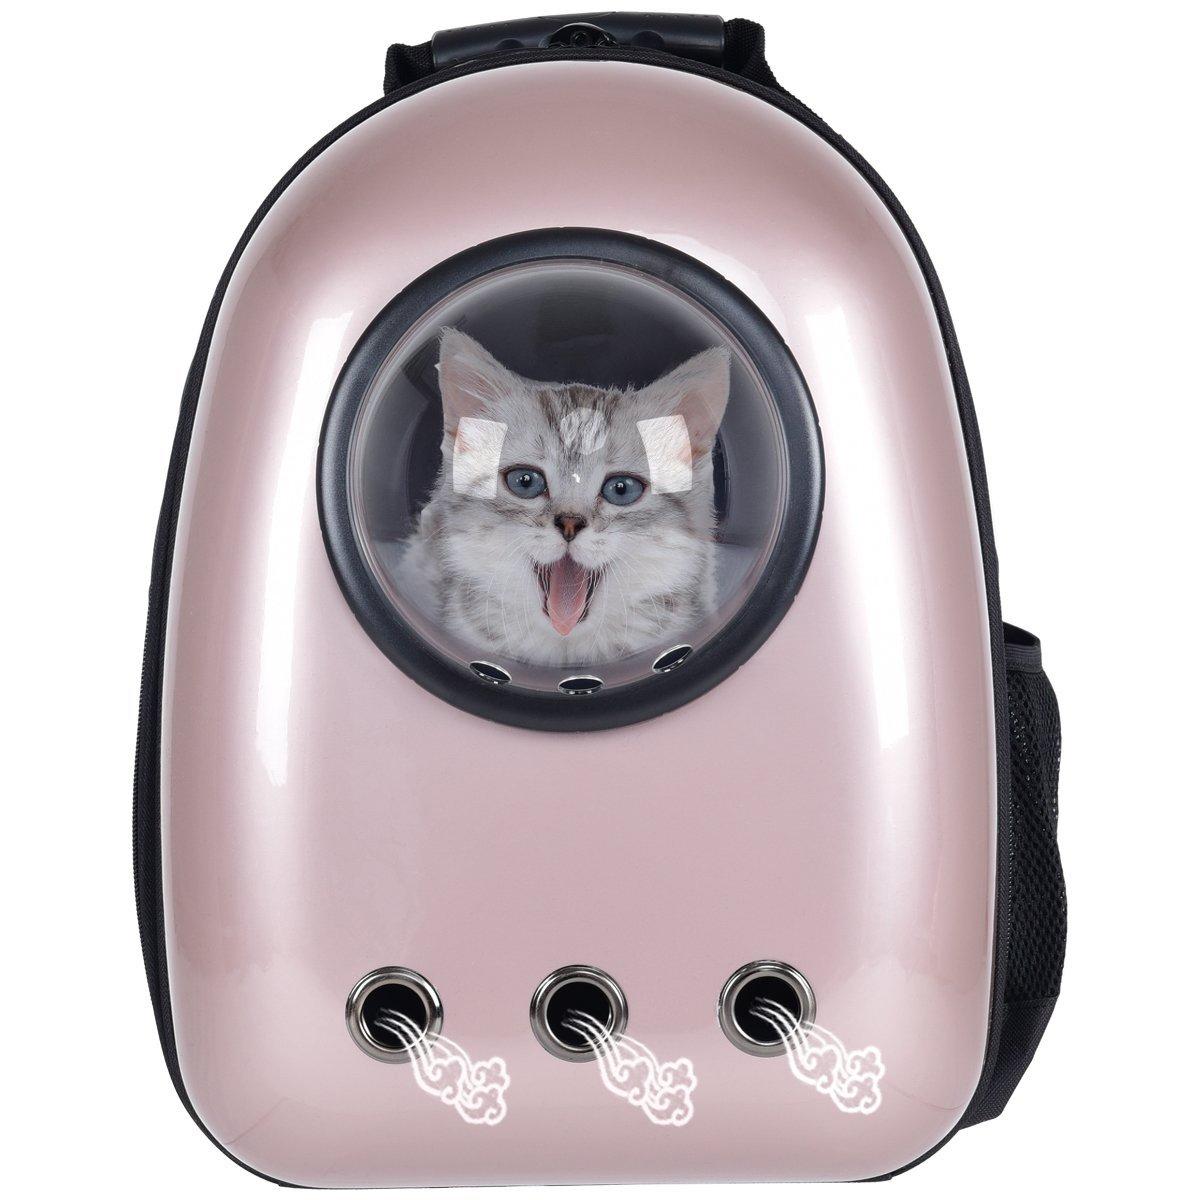 Giantex-Astronaut-Pet-Cat-Dog-Puppy-Carrier-Golden-Color